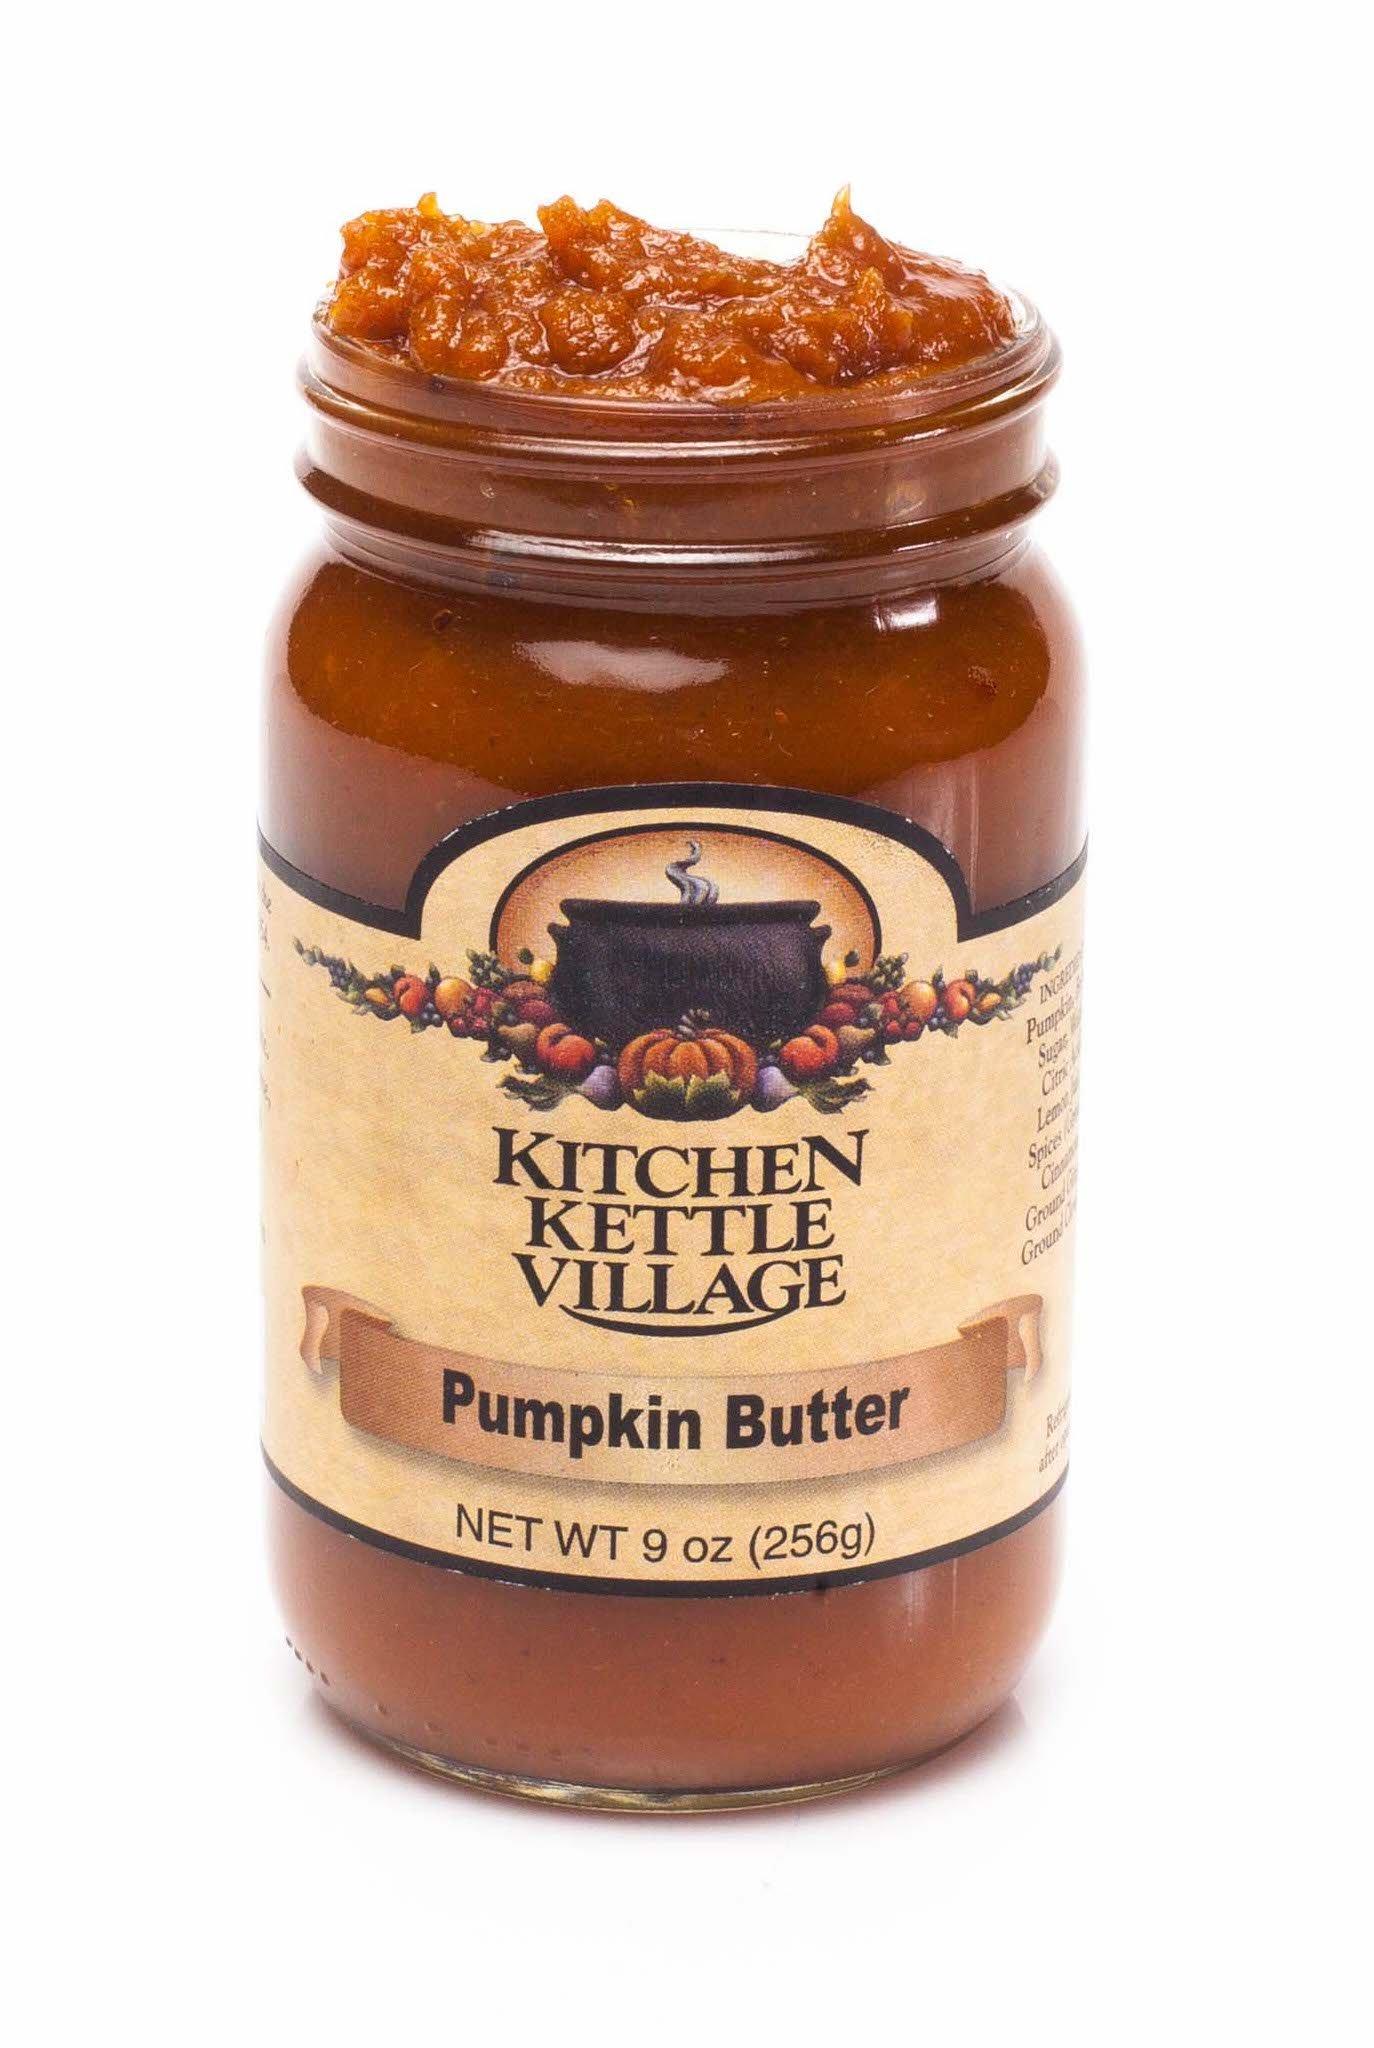 Kitchen Kettle Village Pumpkin Butter, (Amish Made), 9 Ounce Jars (Pack of 2)